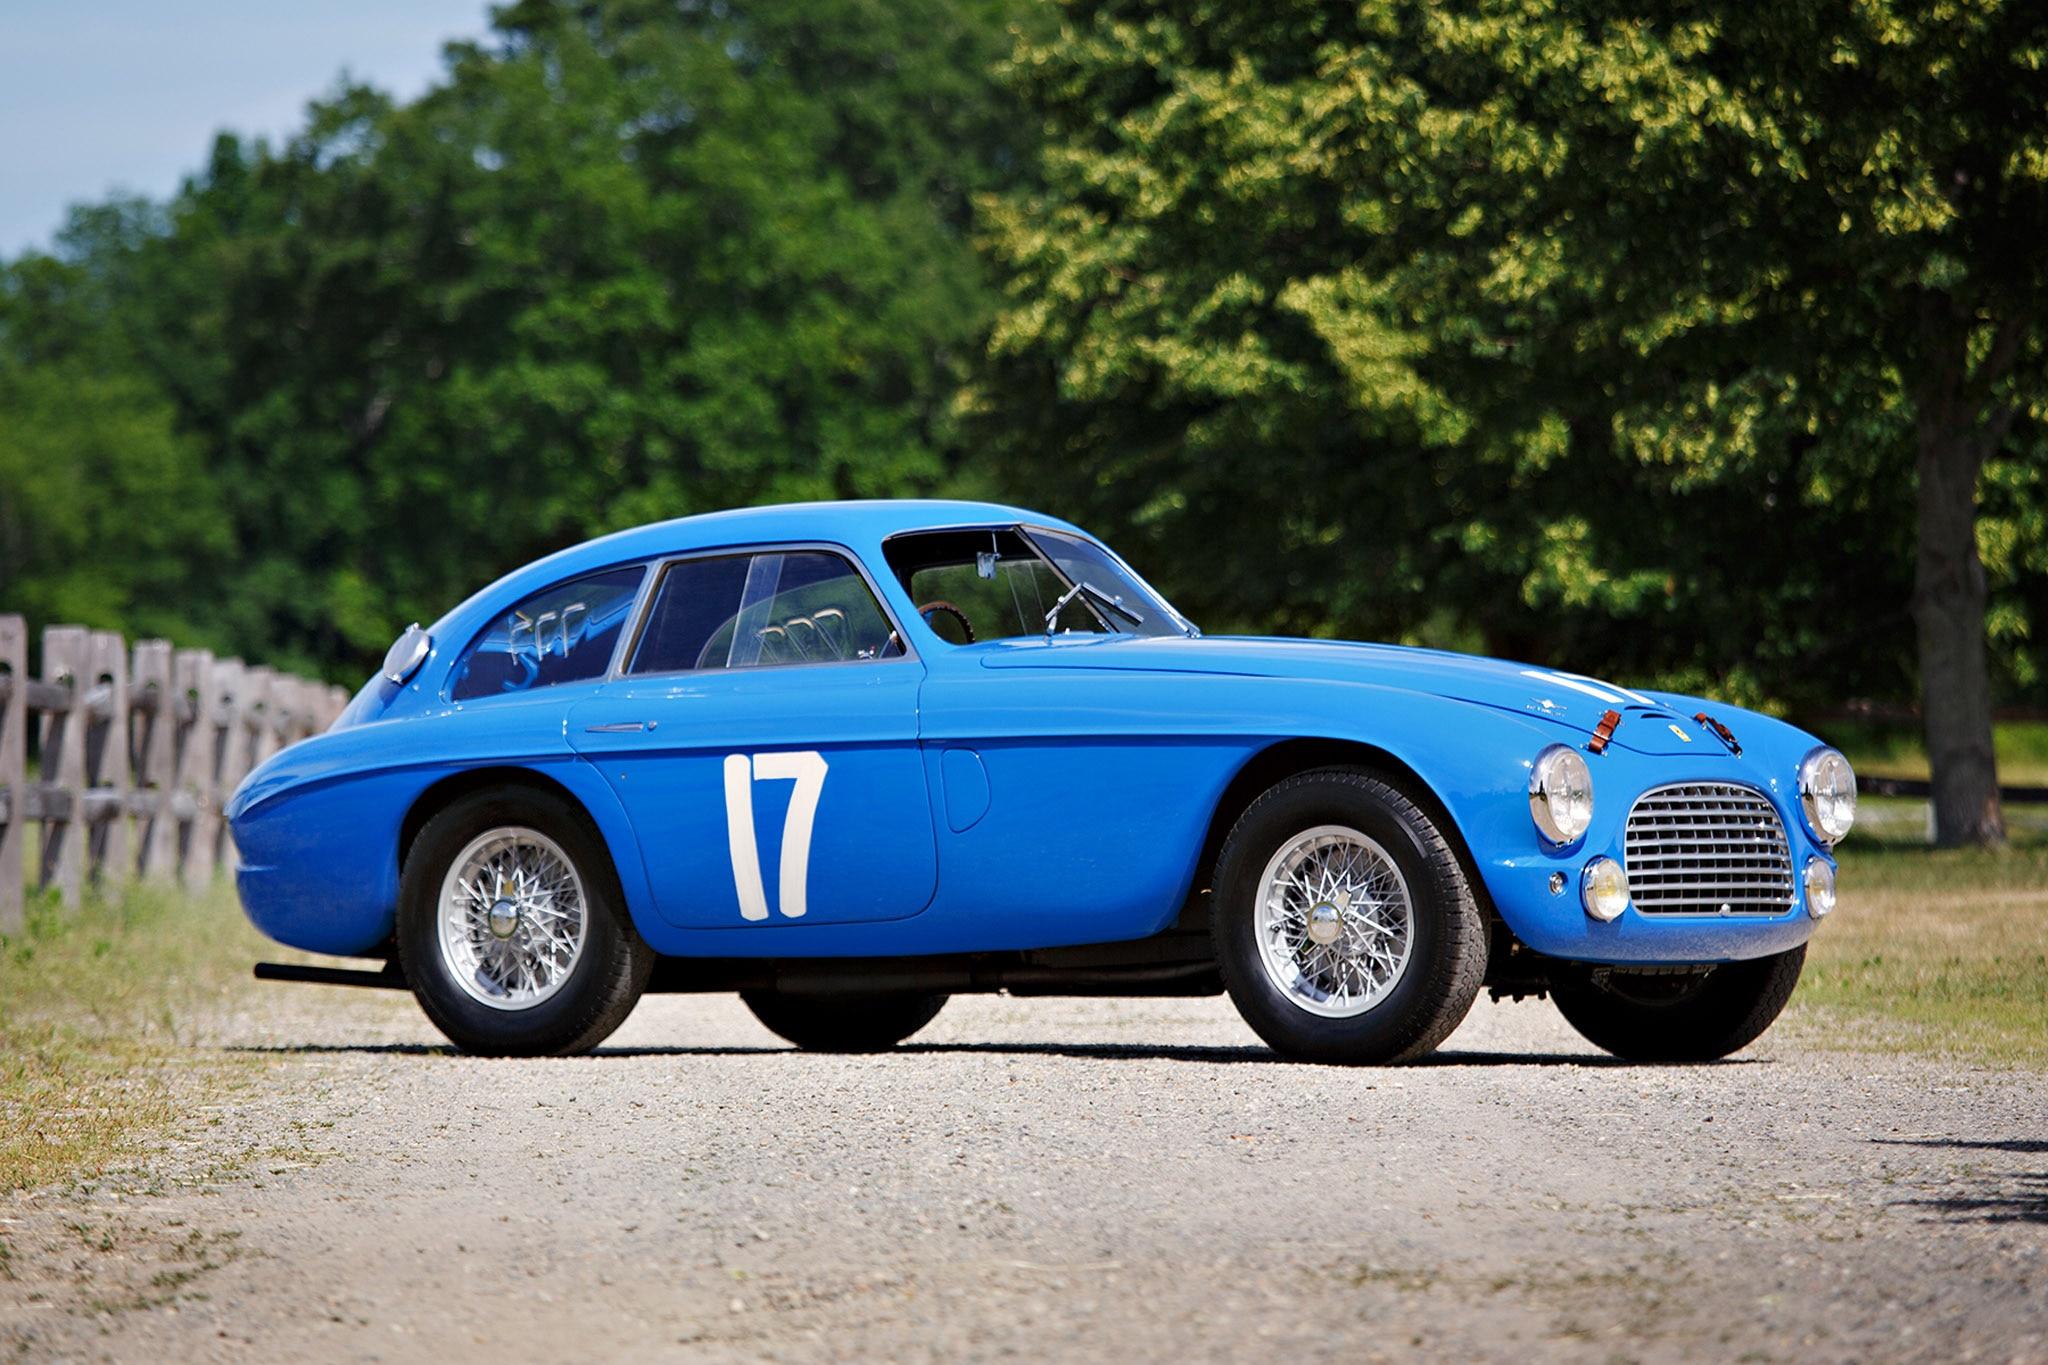 1950_Ferrari_166_M_195S_Berlinetta_Le_Mans_0102_BH